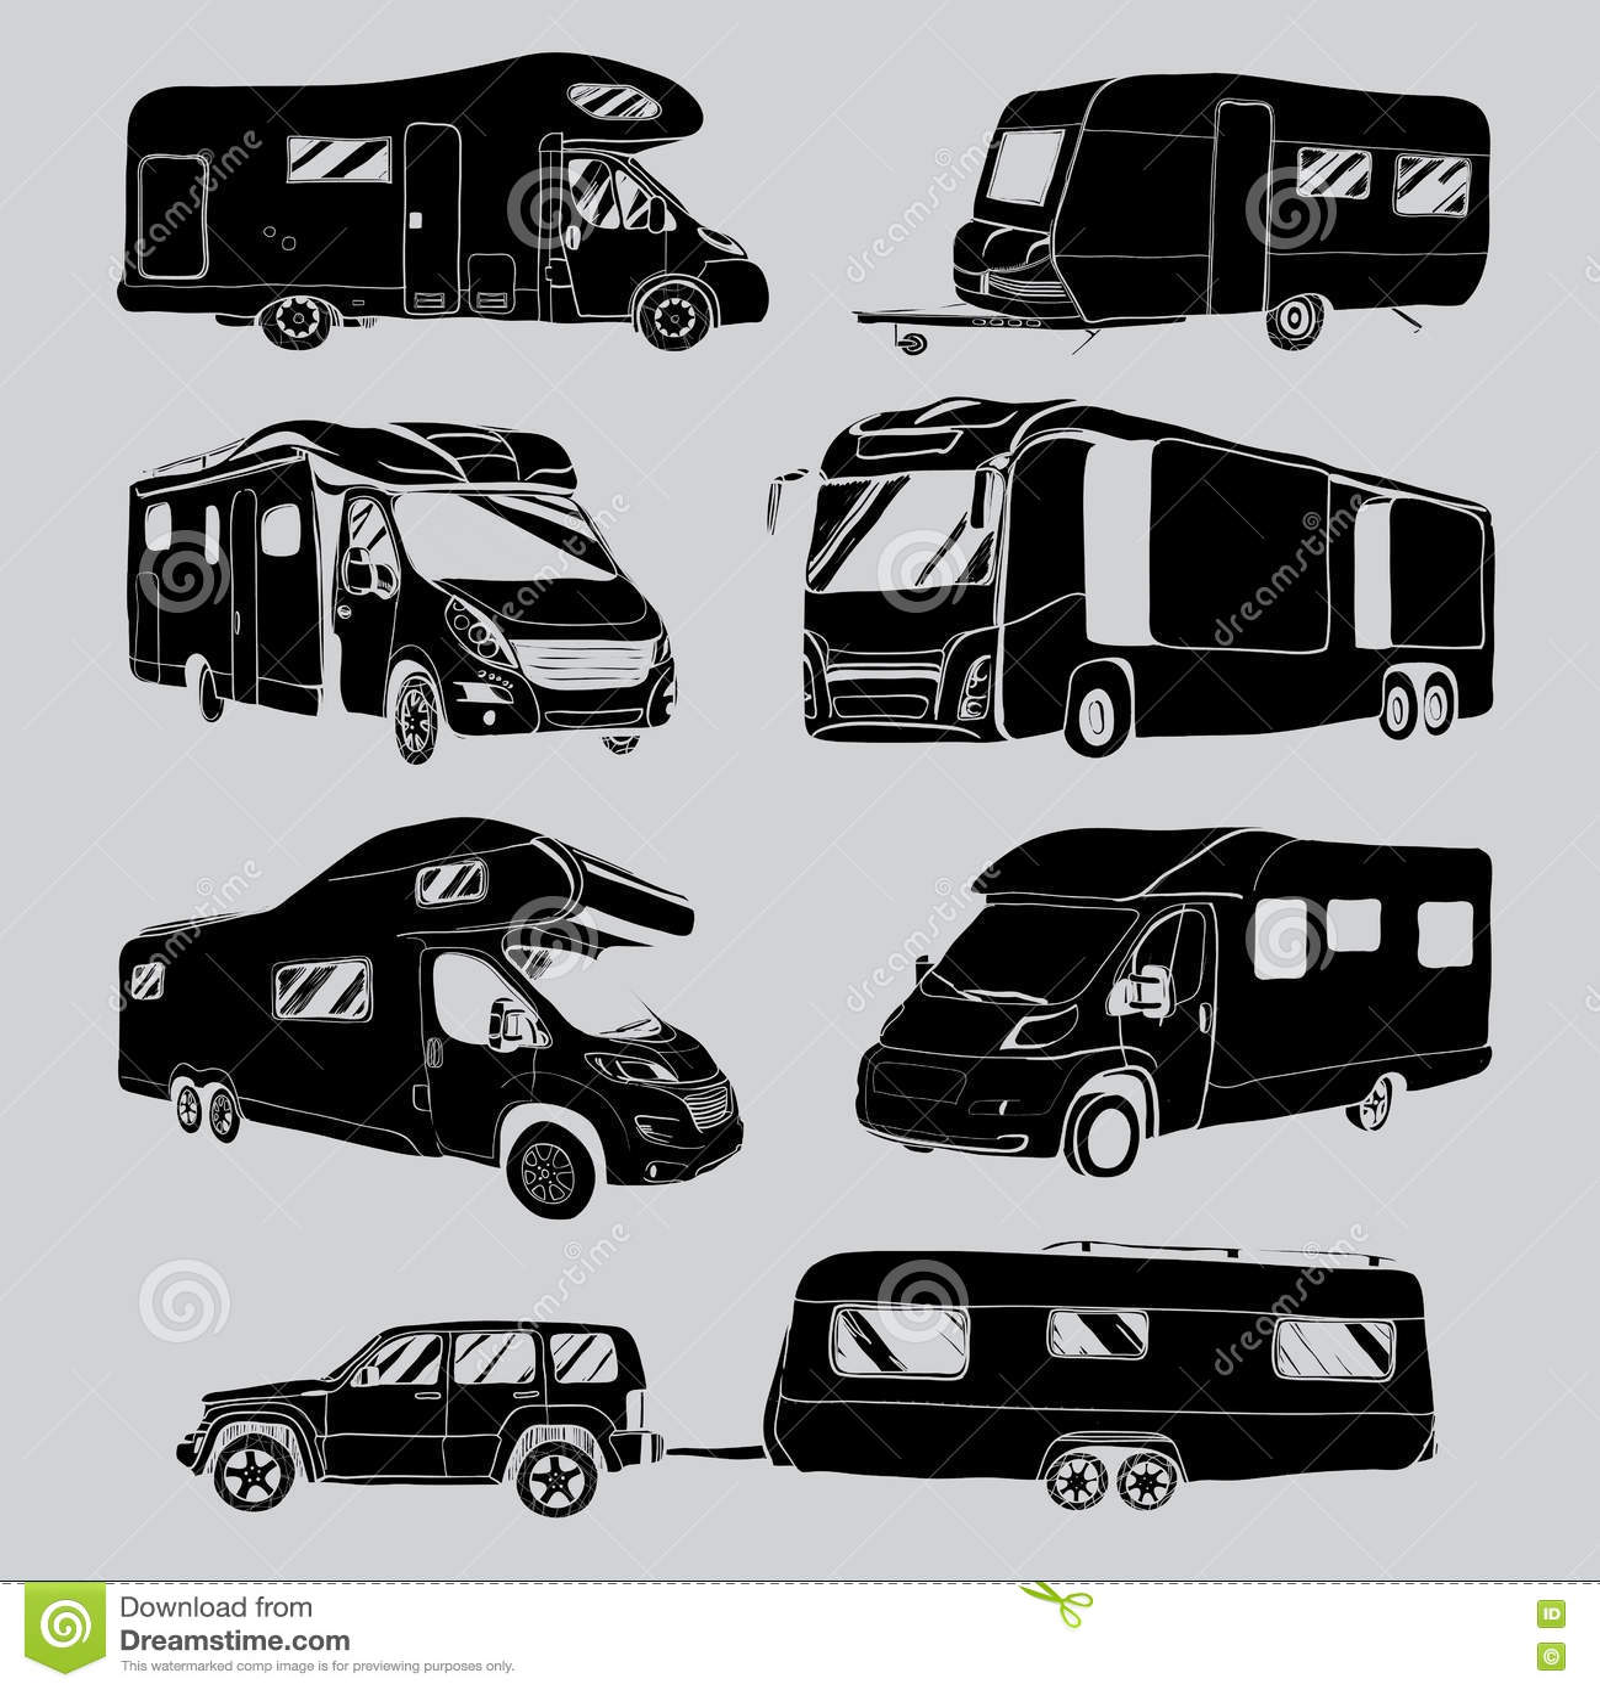 Recreational Vehicle: Cars Recreational Vehicles Camper Vans Caravans Icons